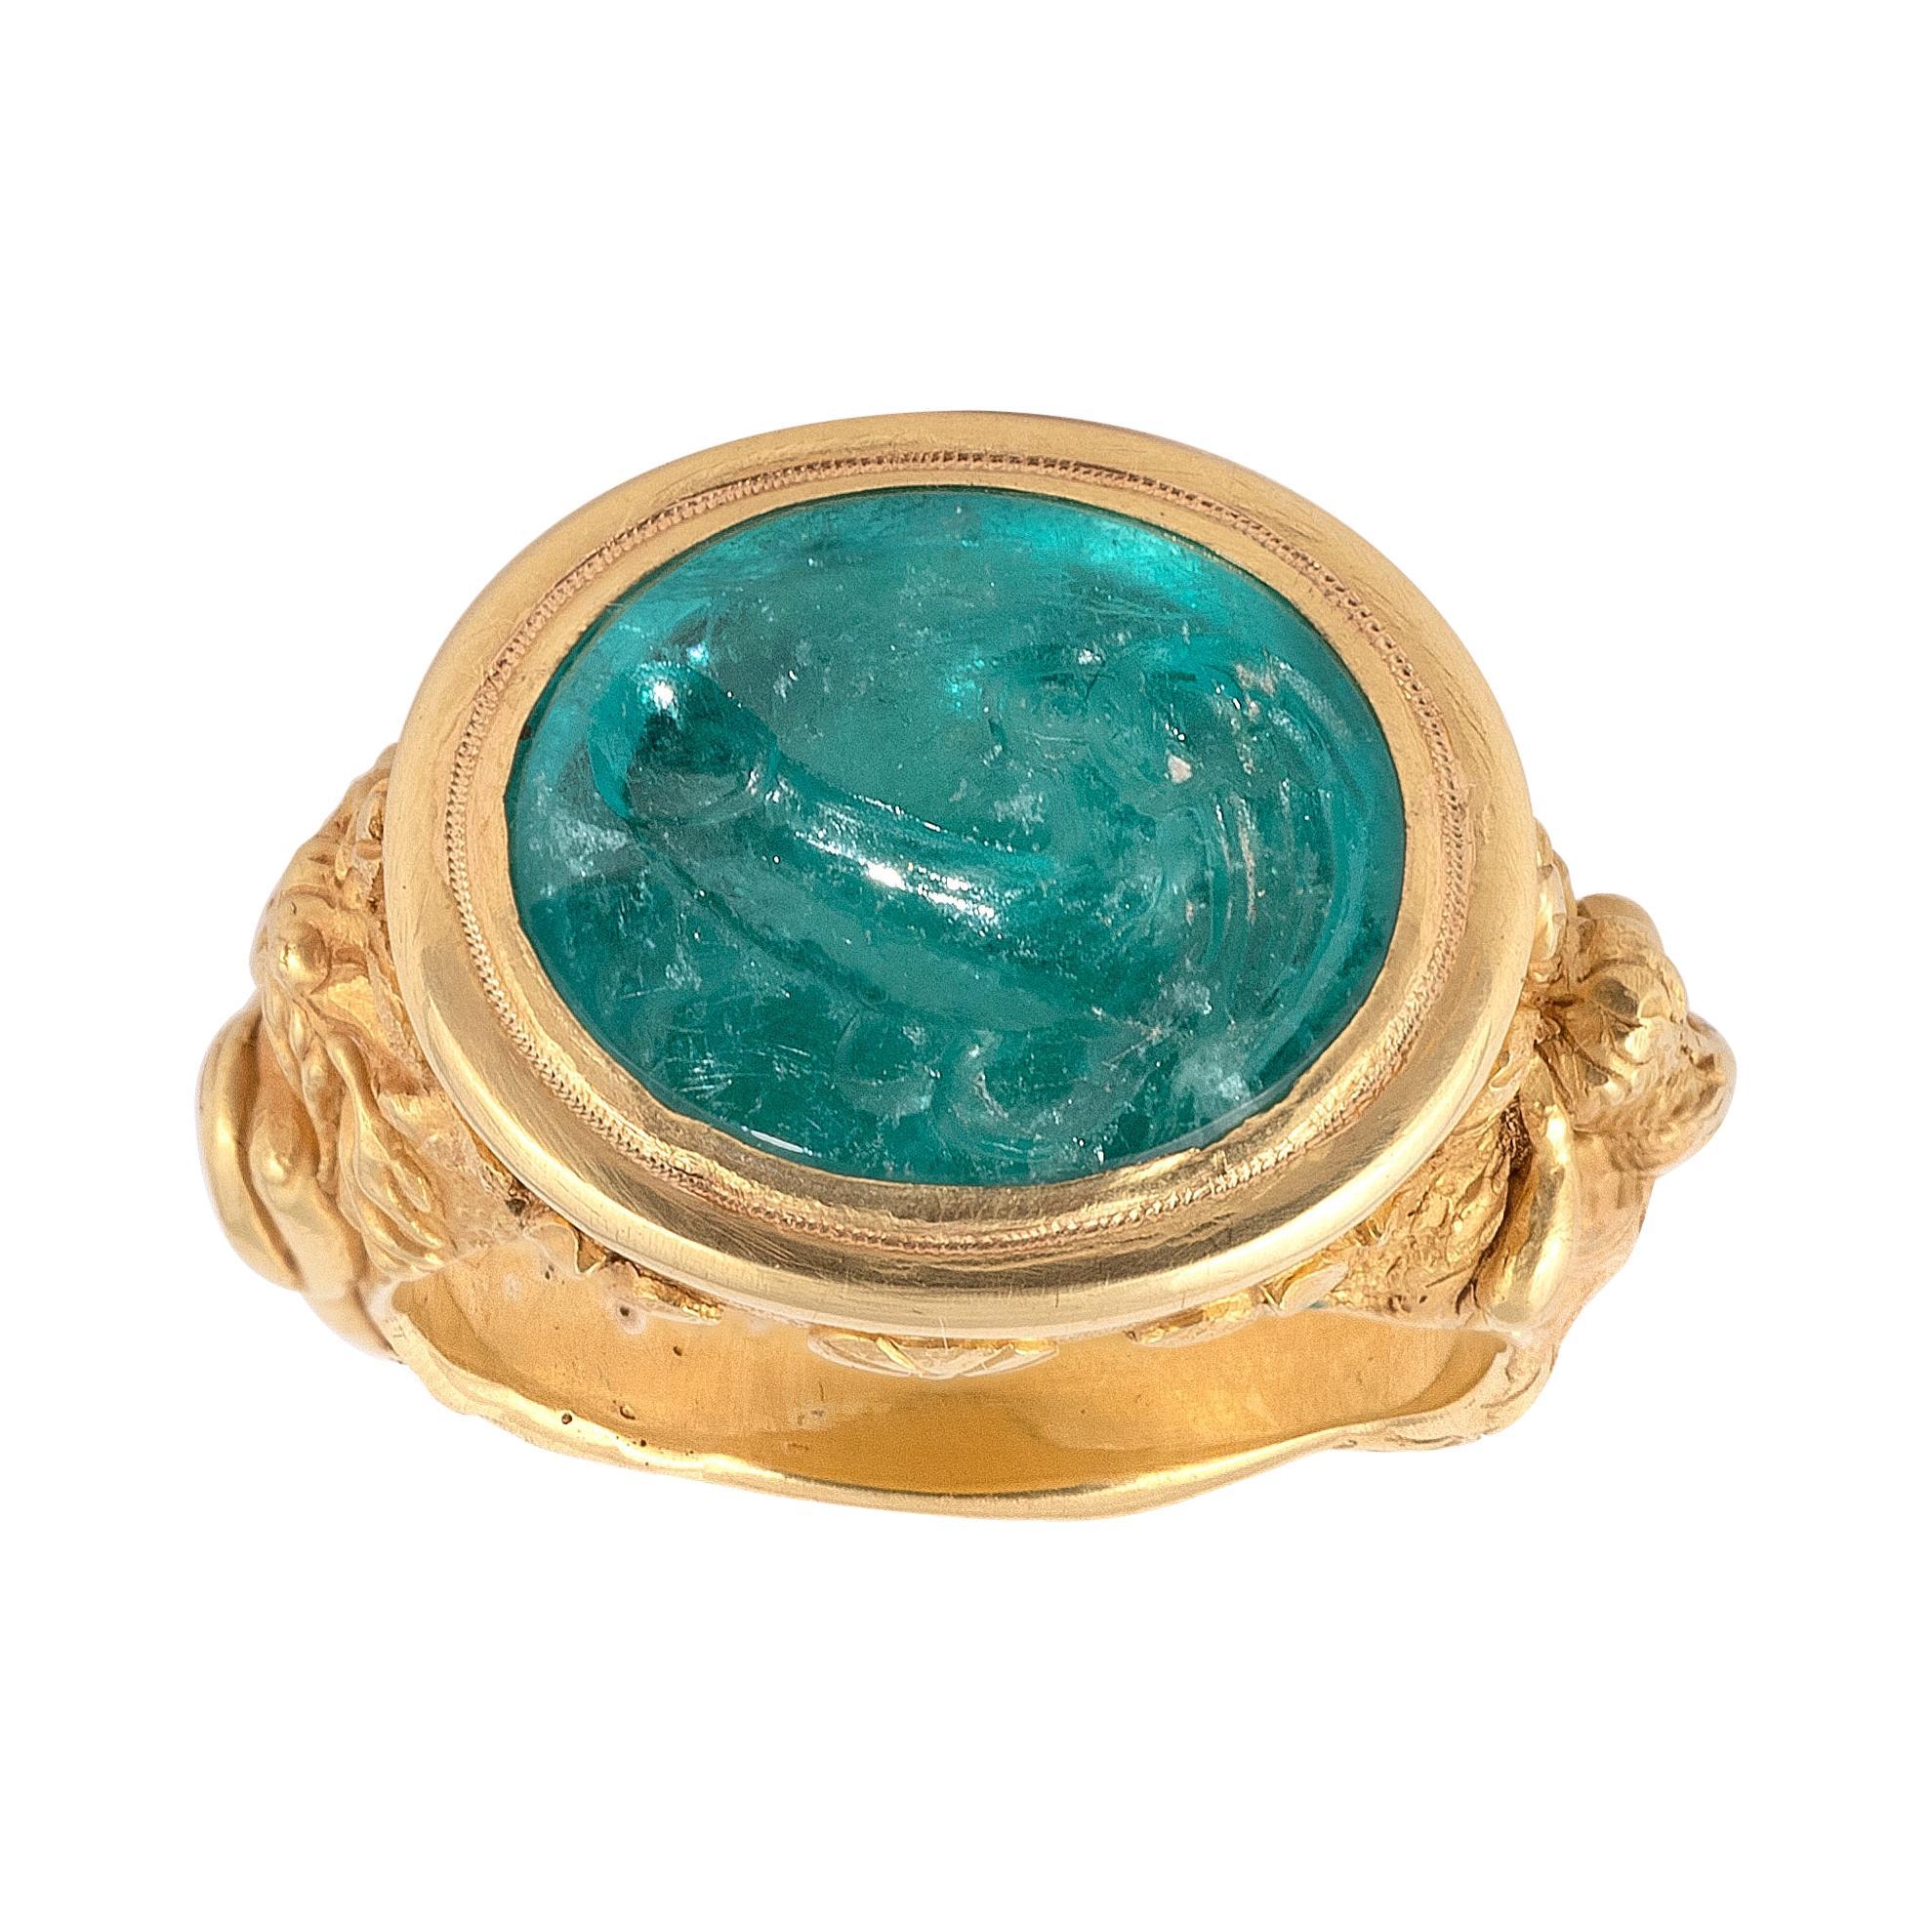 Antique Gold and Emerald Intaglio Winged Phallus Ring